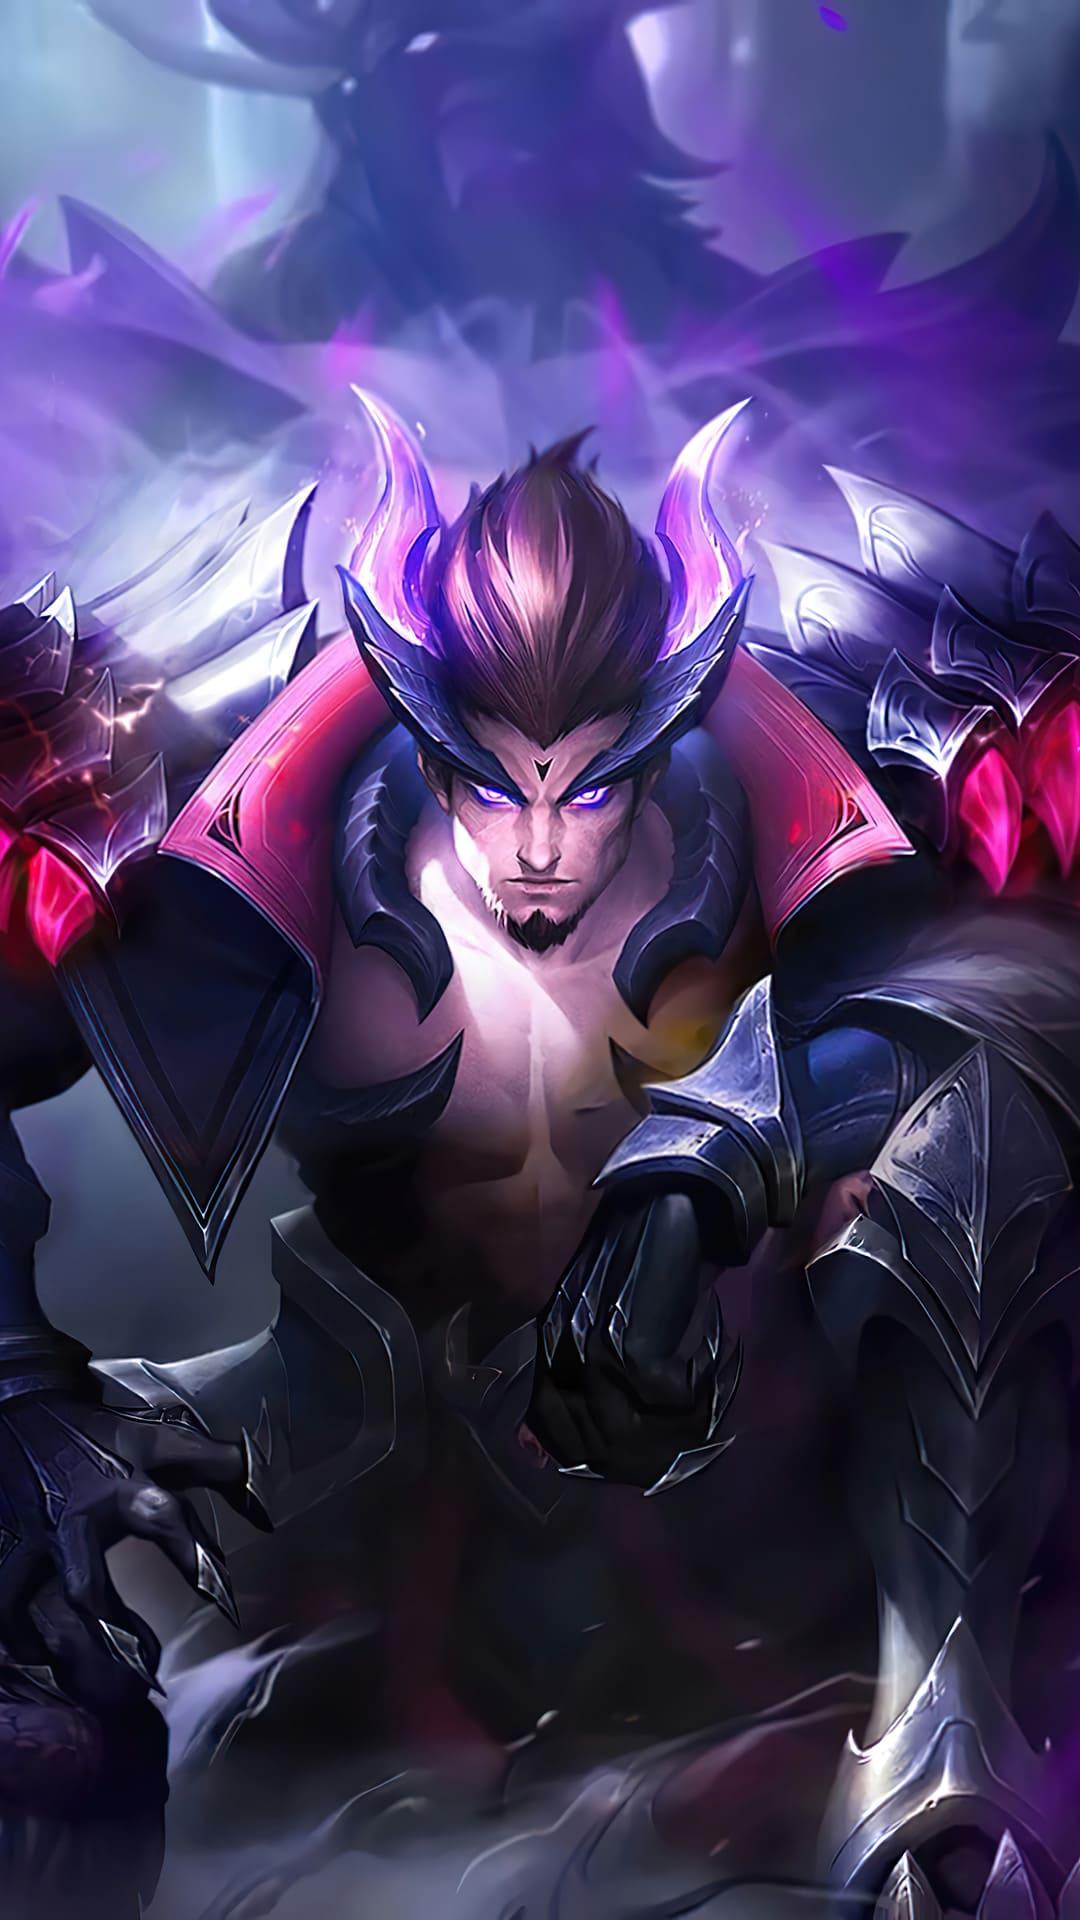 wallpaper yu zhong mobile legends black fierce dragon for mobile hobigame